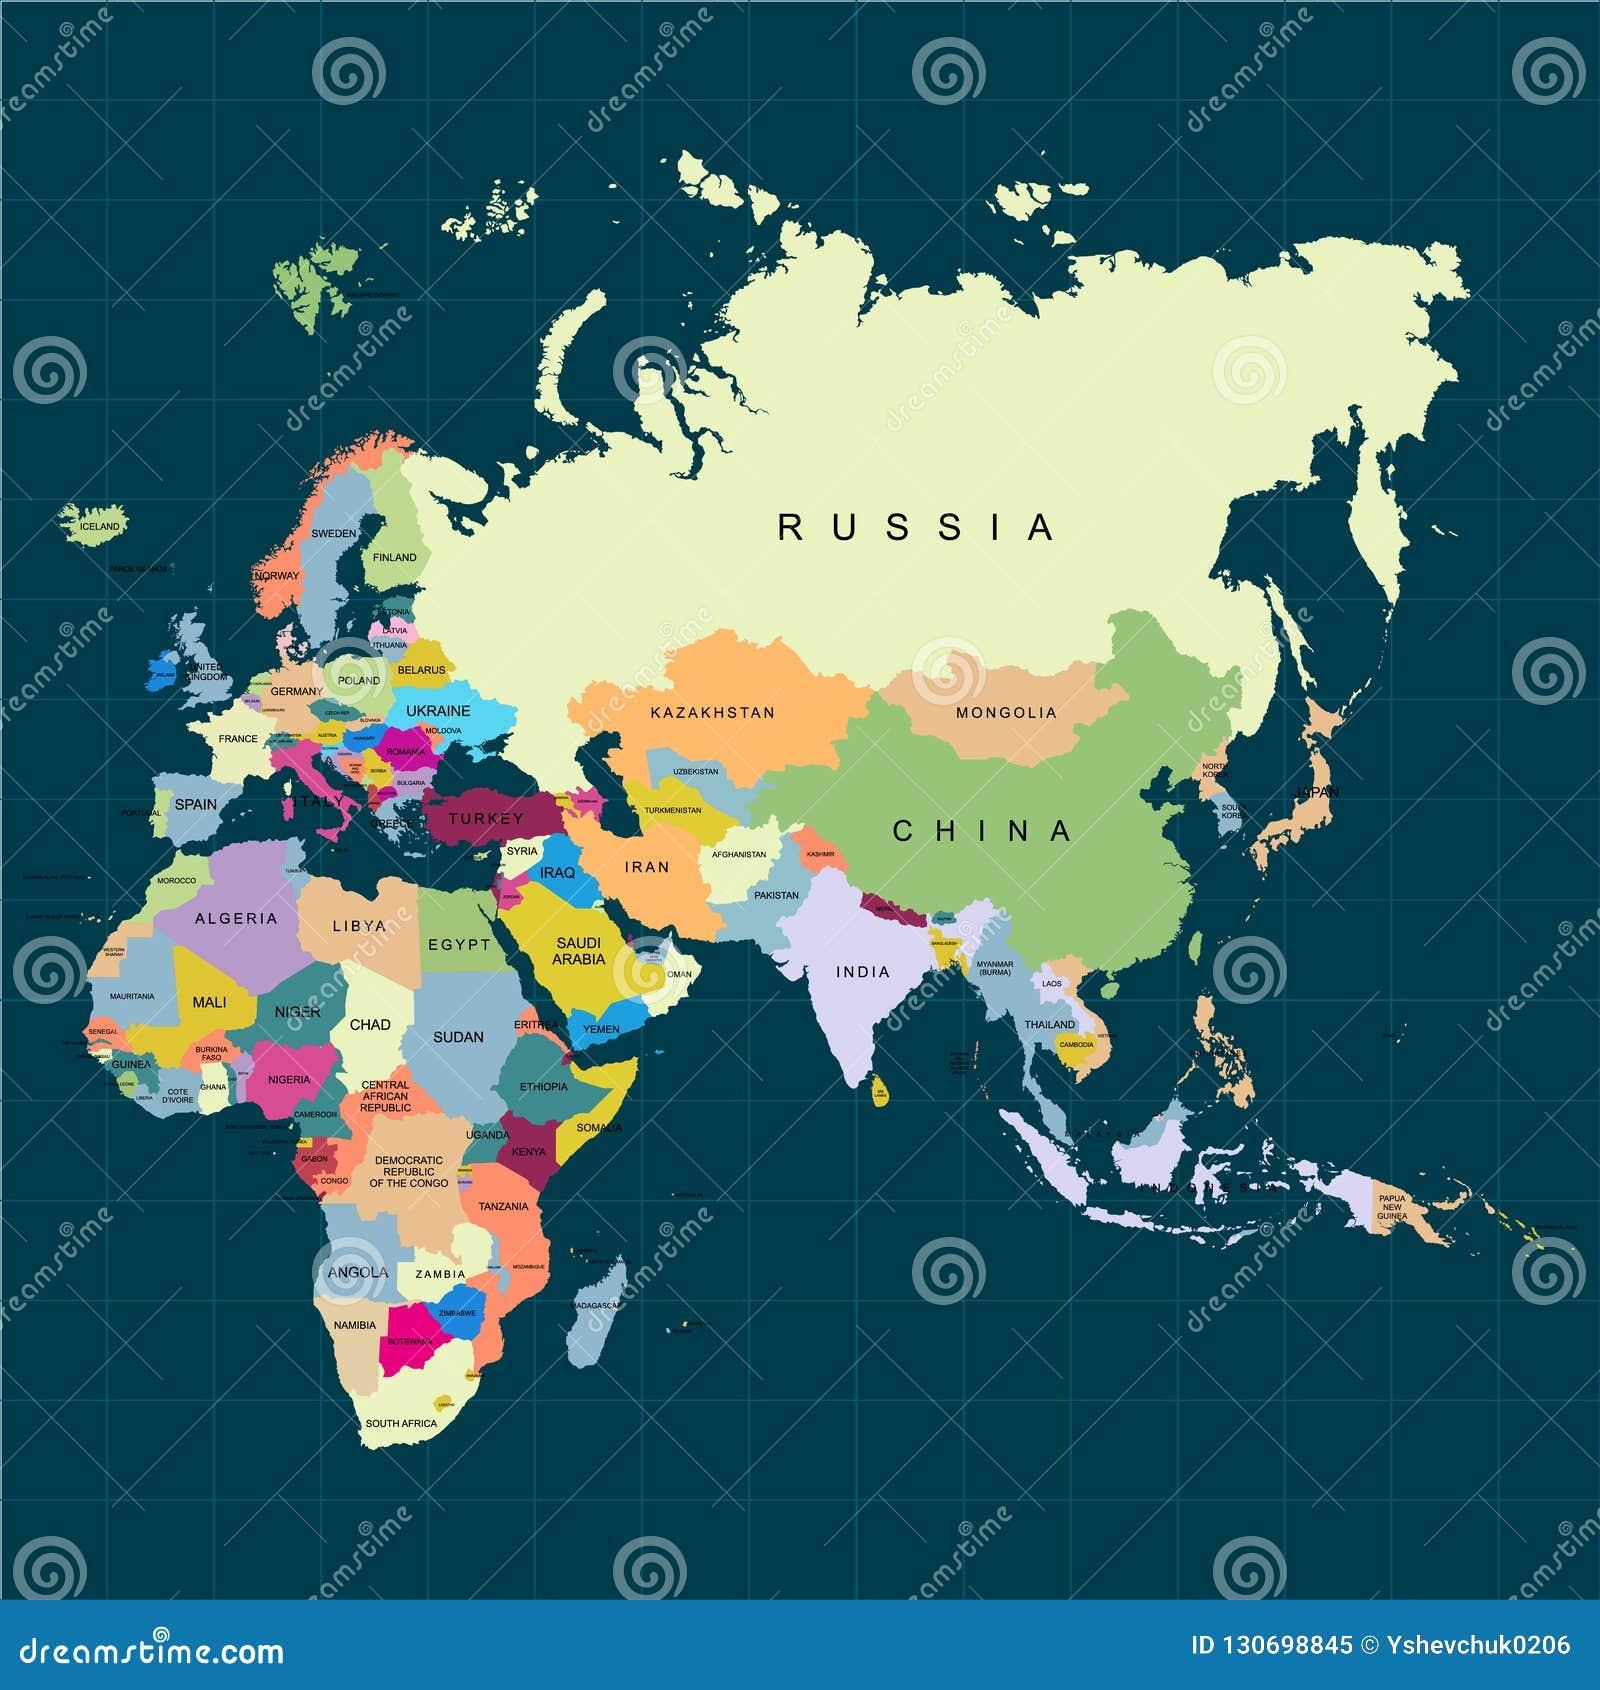 Europa Asia Cartina.Territory Of Continents Africa Europe Asia Eurasia